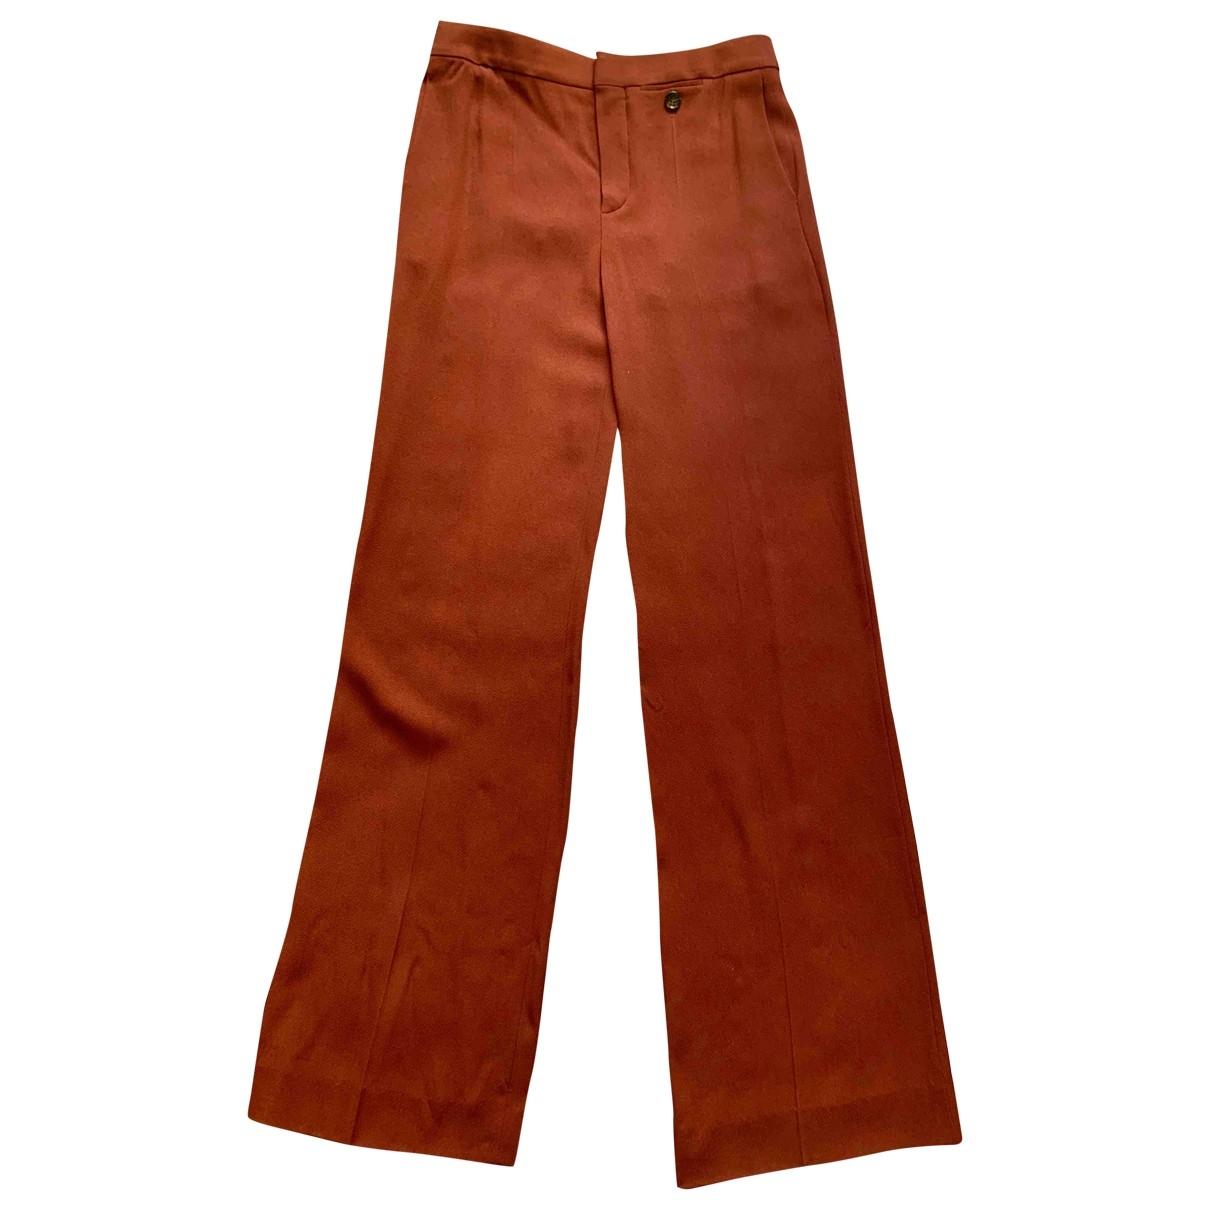 Chloé \N Brown Trousers for Women 38 FR